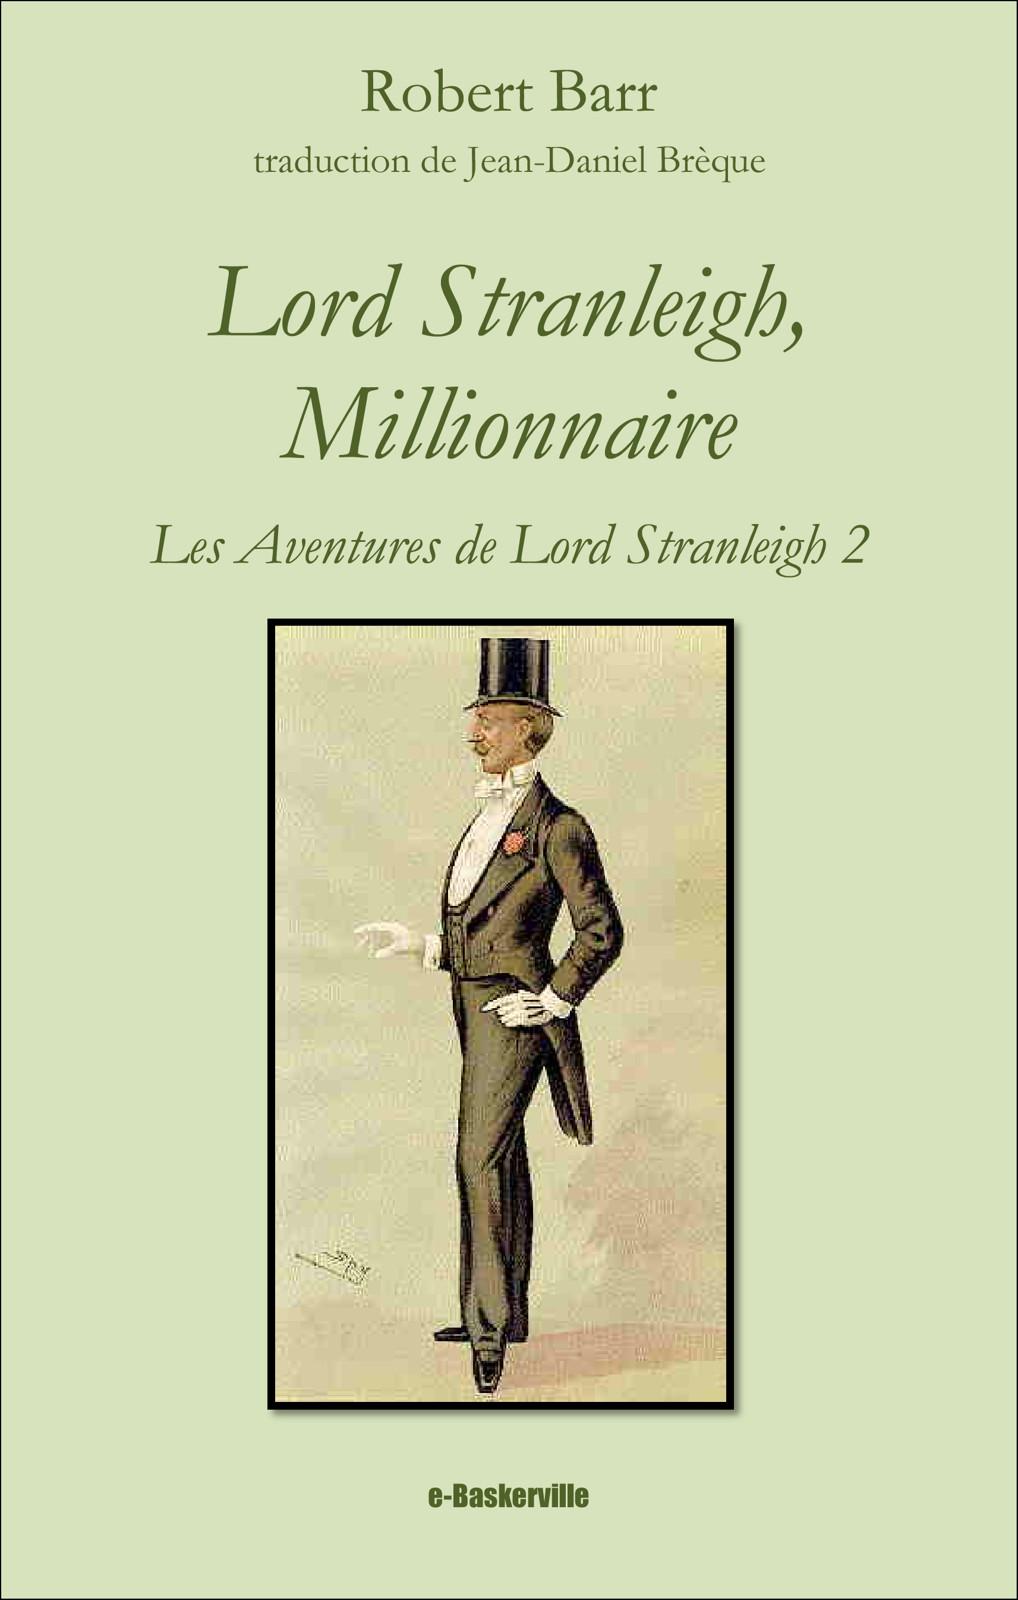 Lord Stranleigh, millionnaire (les aventures de Lord Stranleigh, 2)